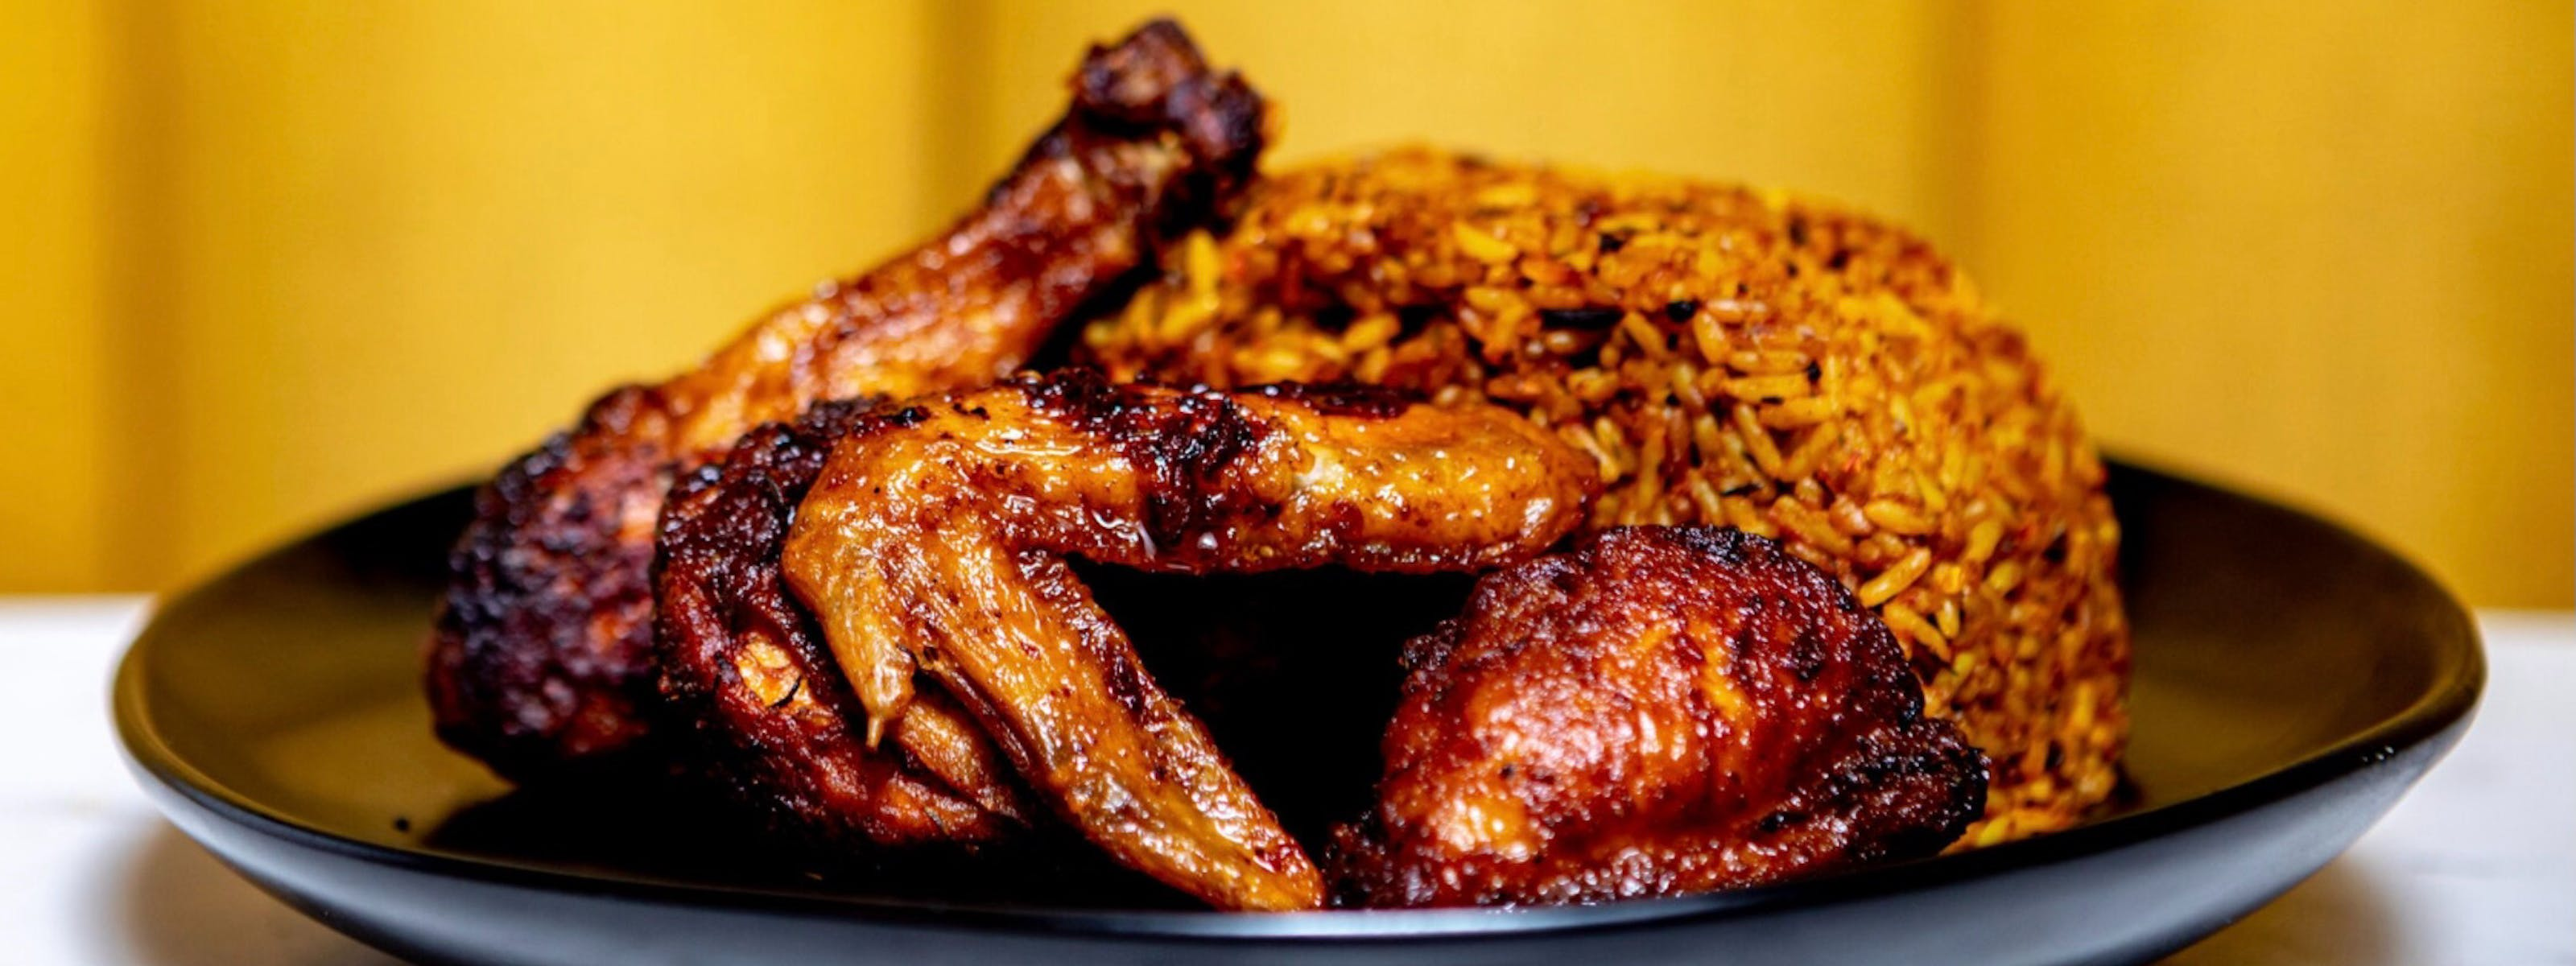 The Best Nigerian Restaurants in New York City - New York - The Infatuation